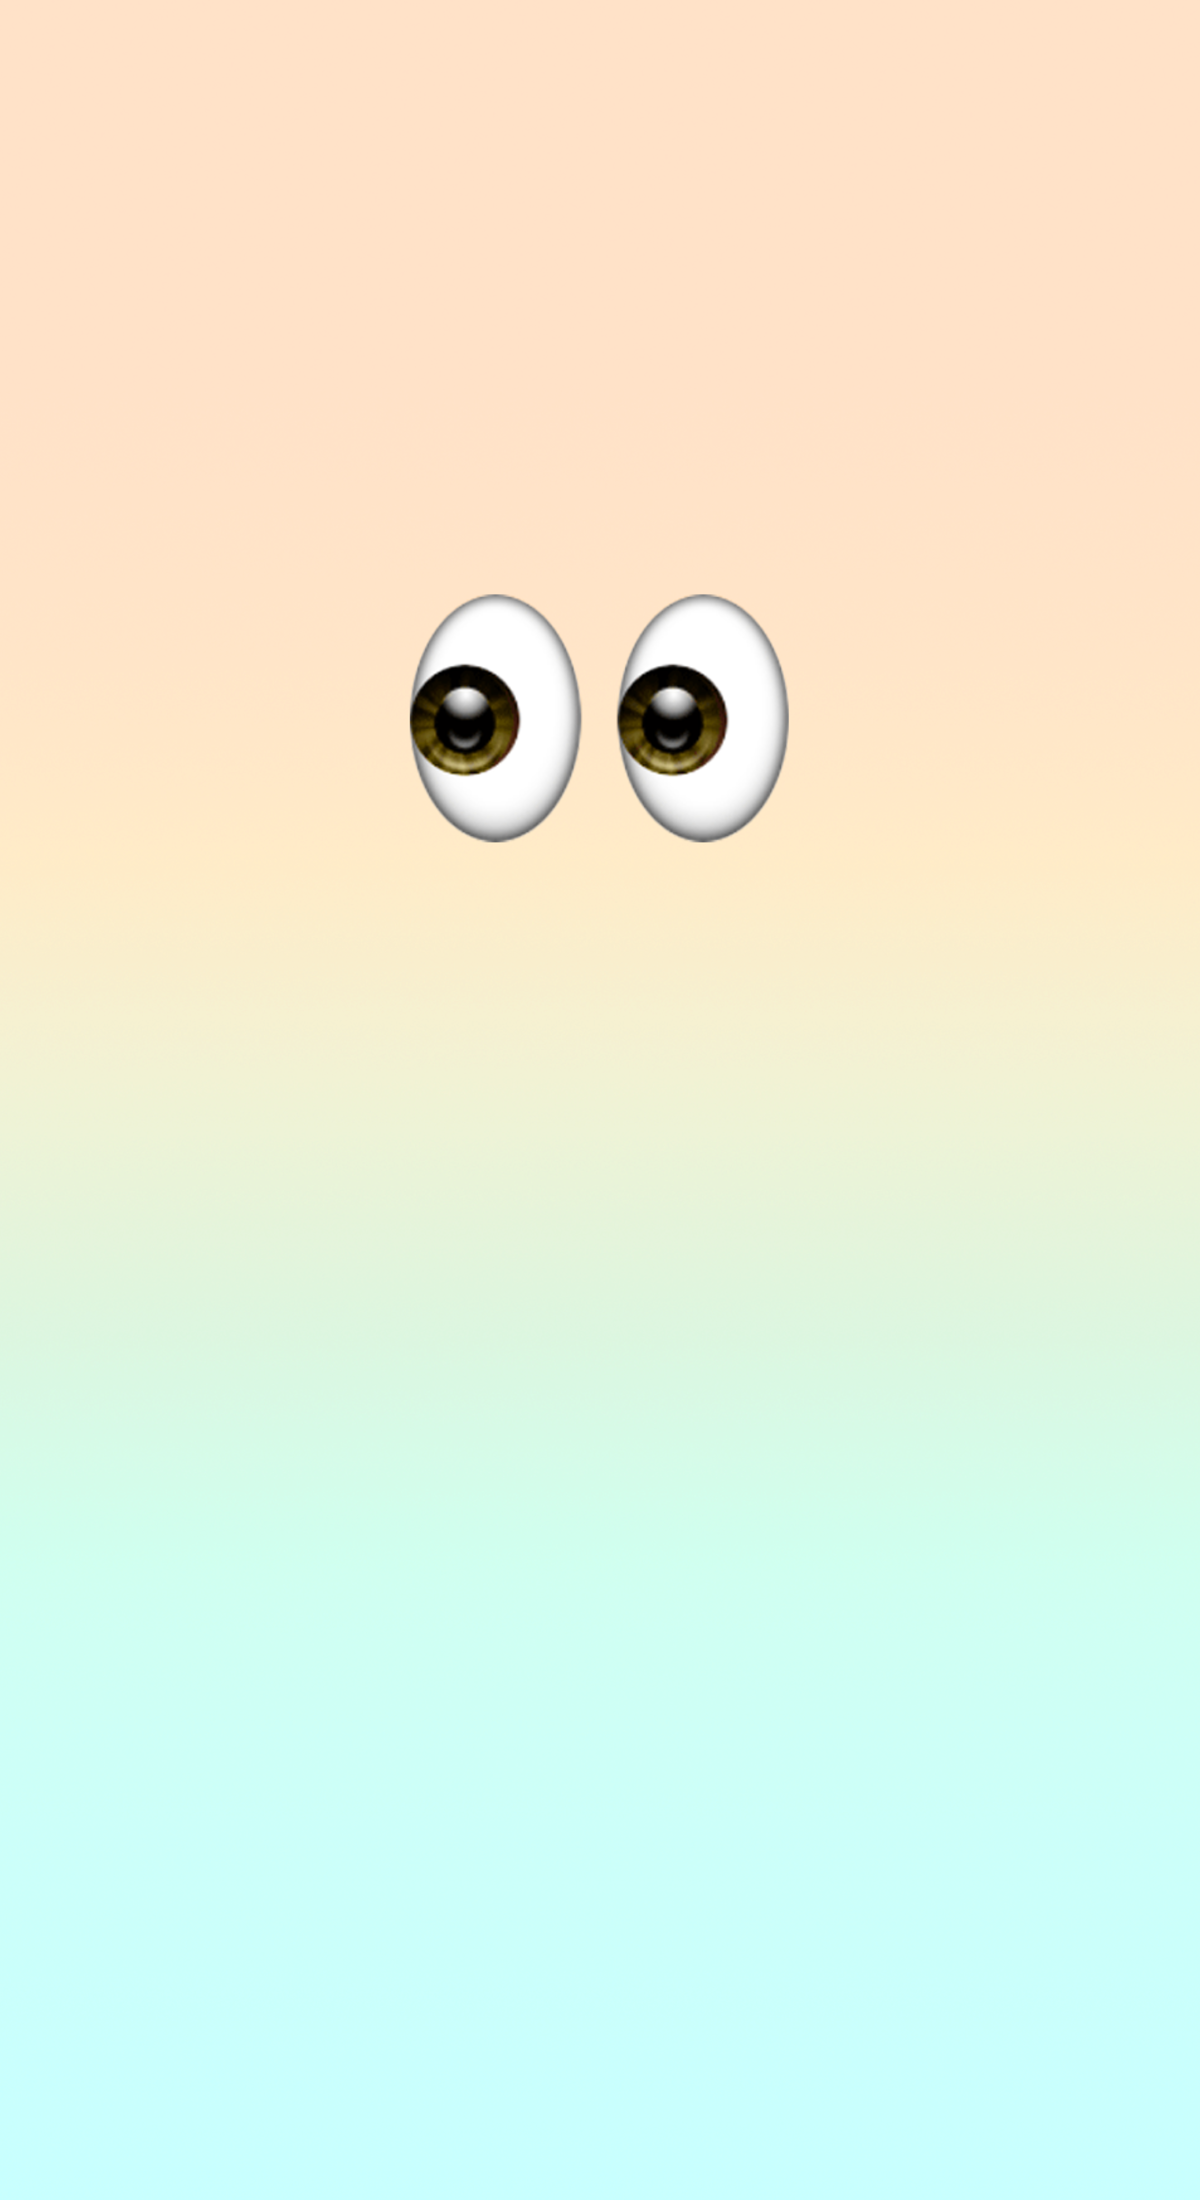 Medium page large ux blog eyes2